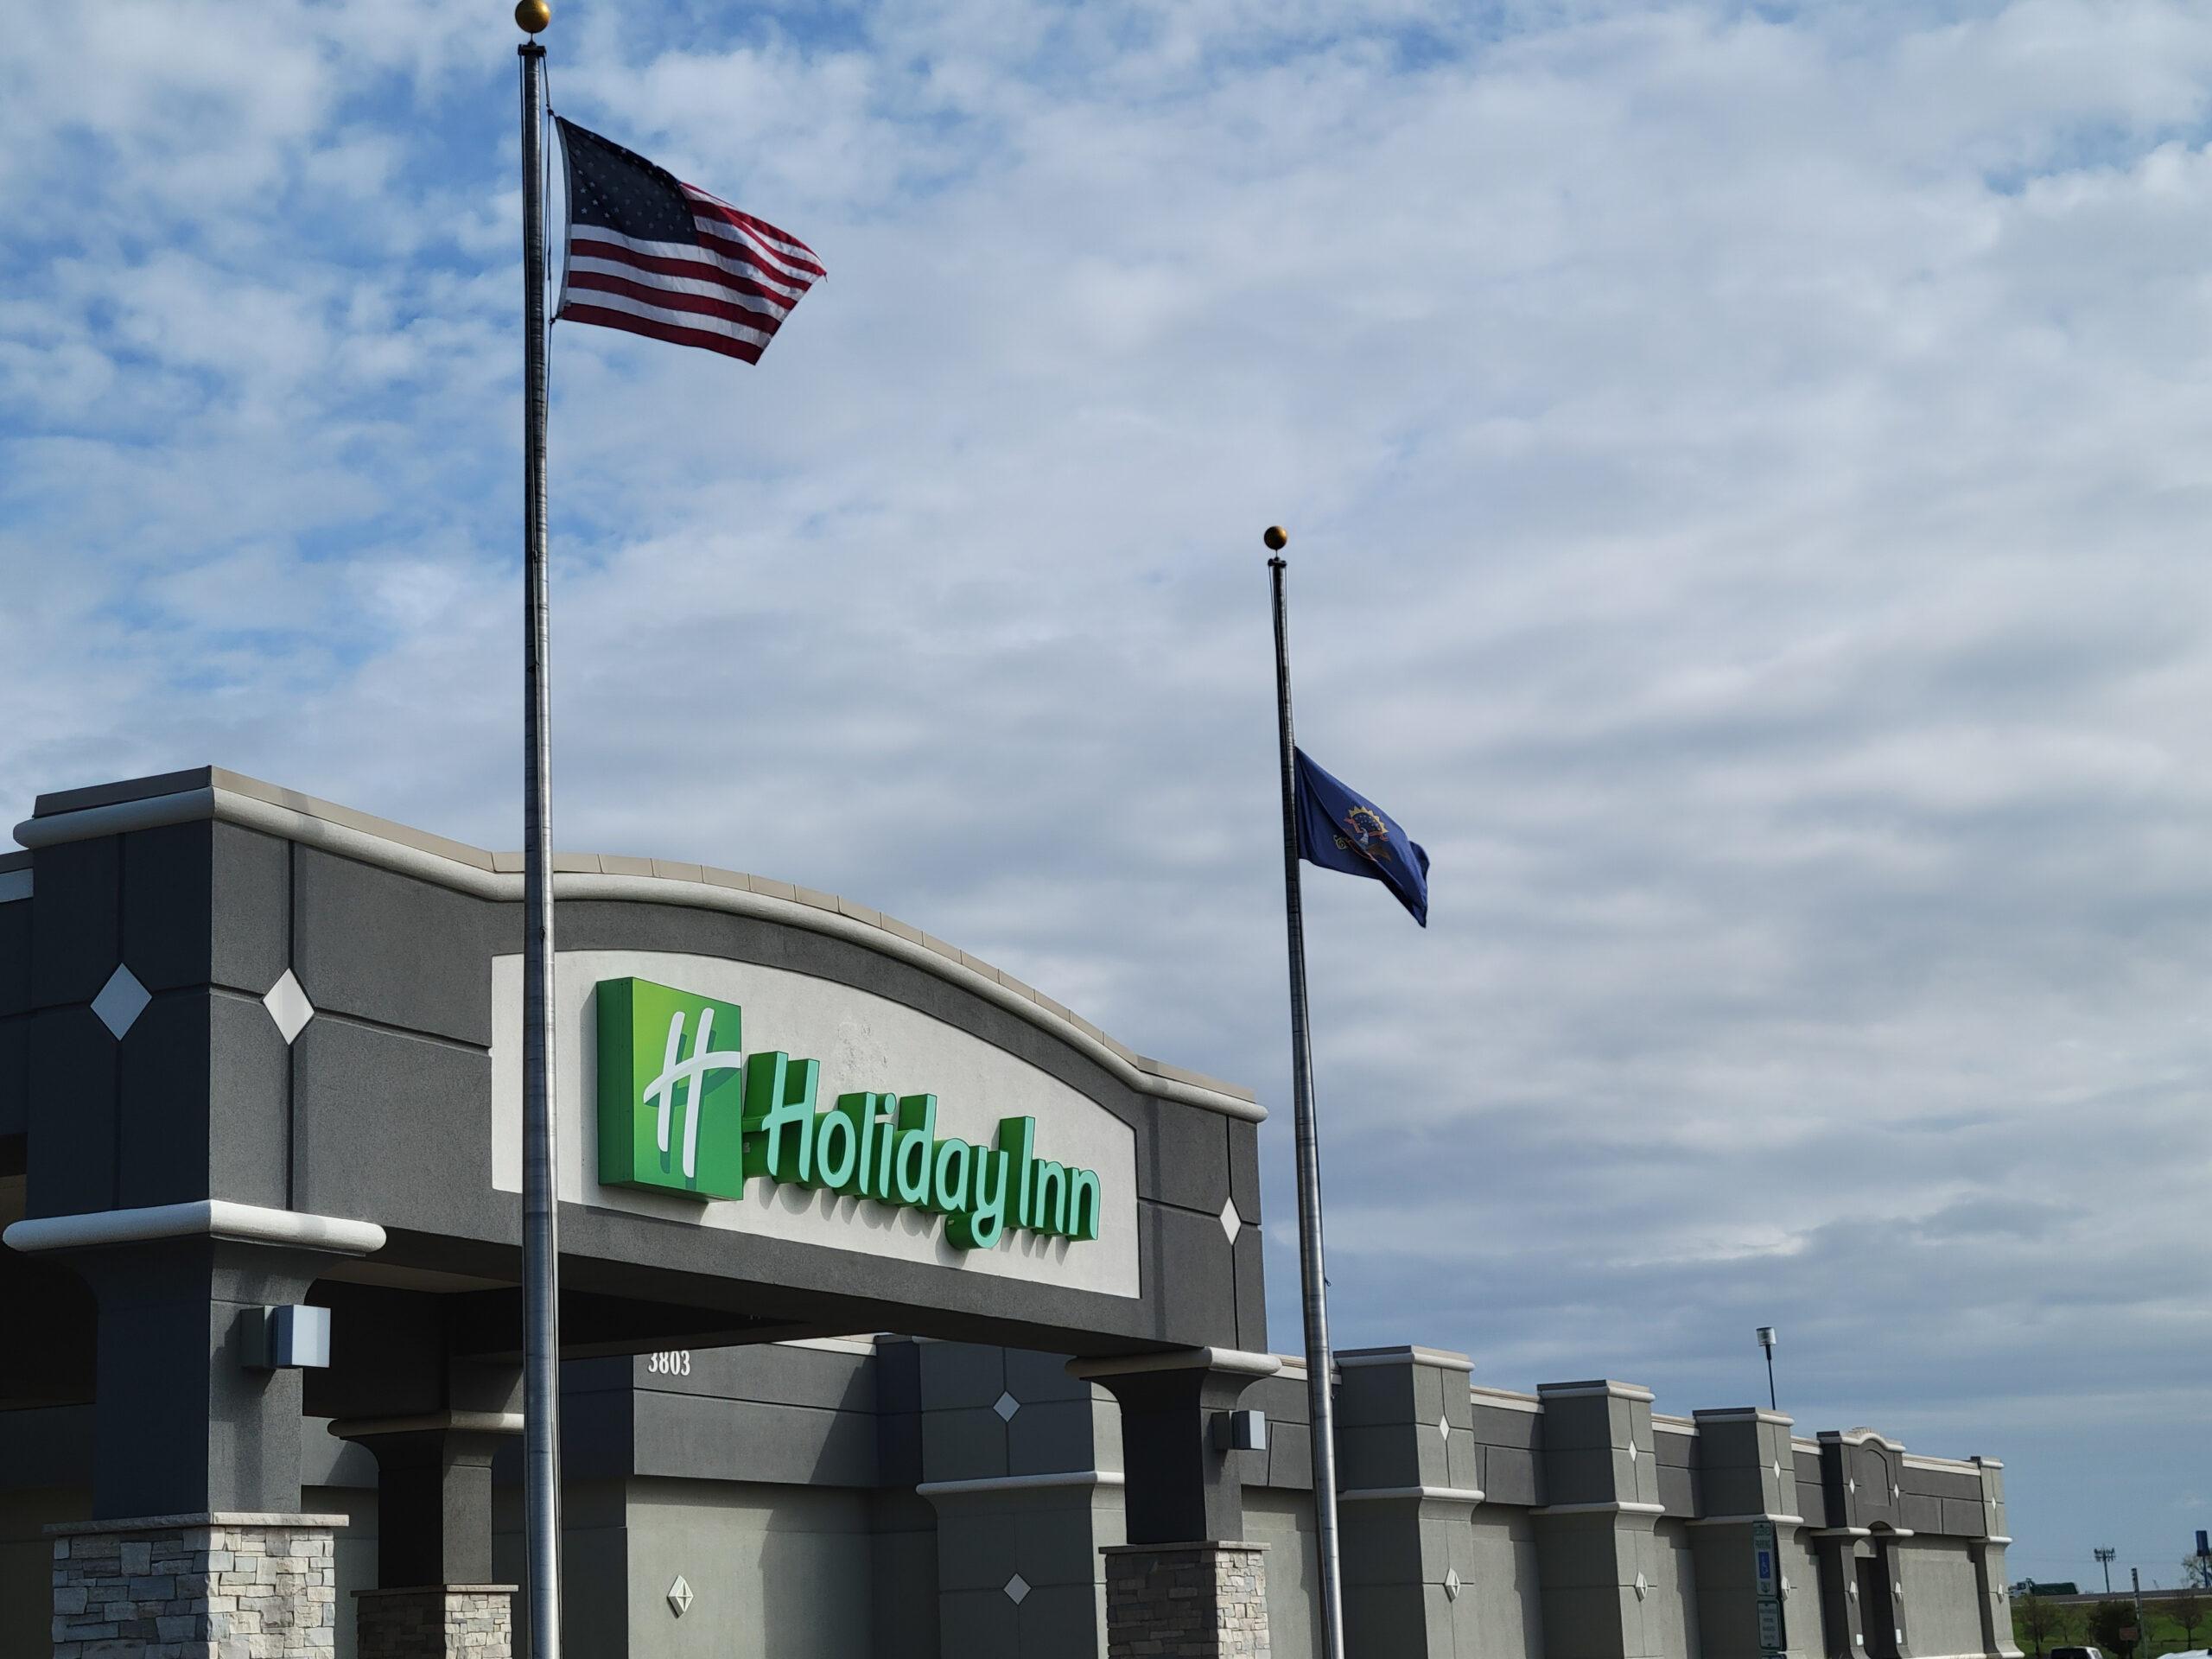 20211002 112540 scaled - The Holiday Inn, Fargo North Dakota